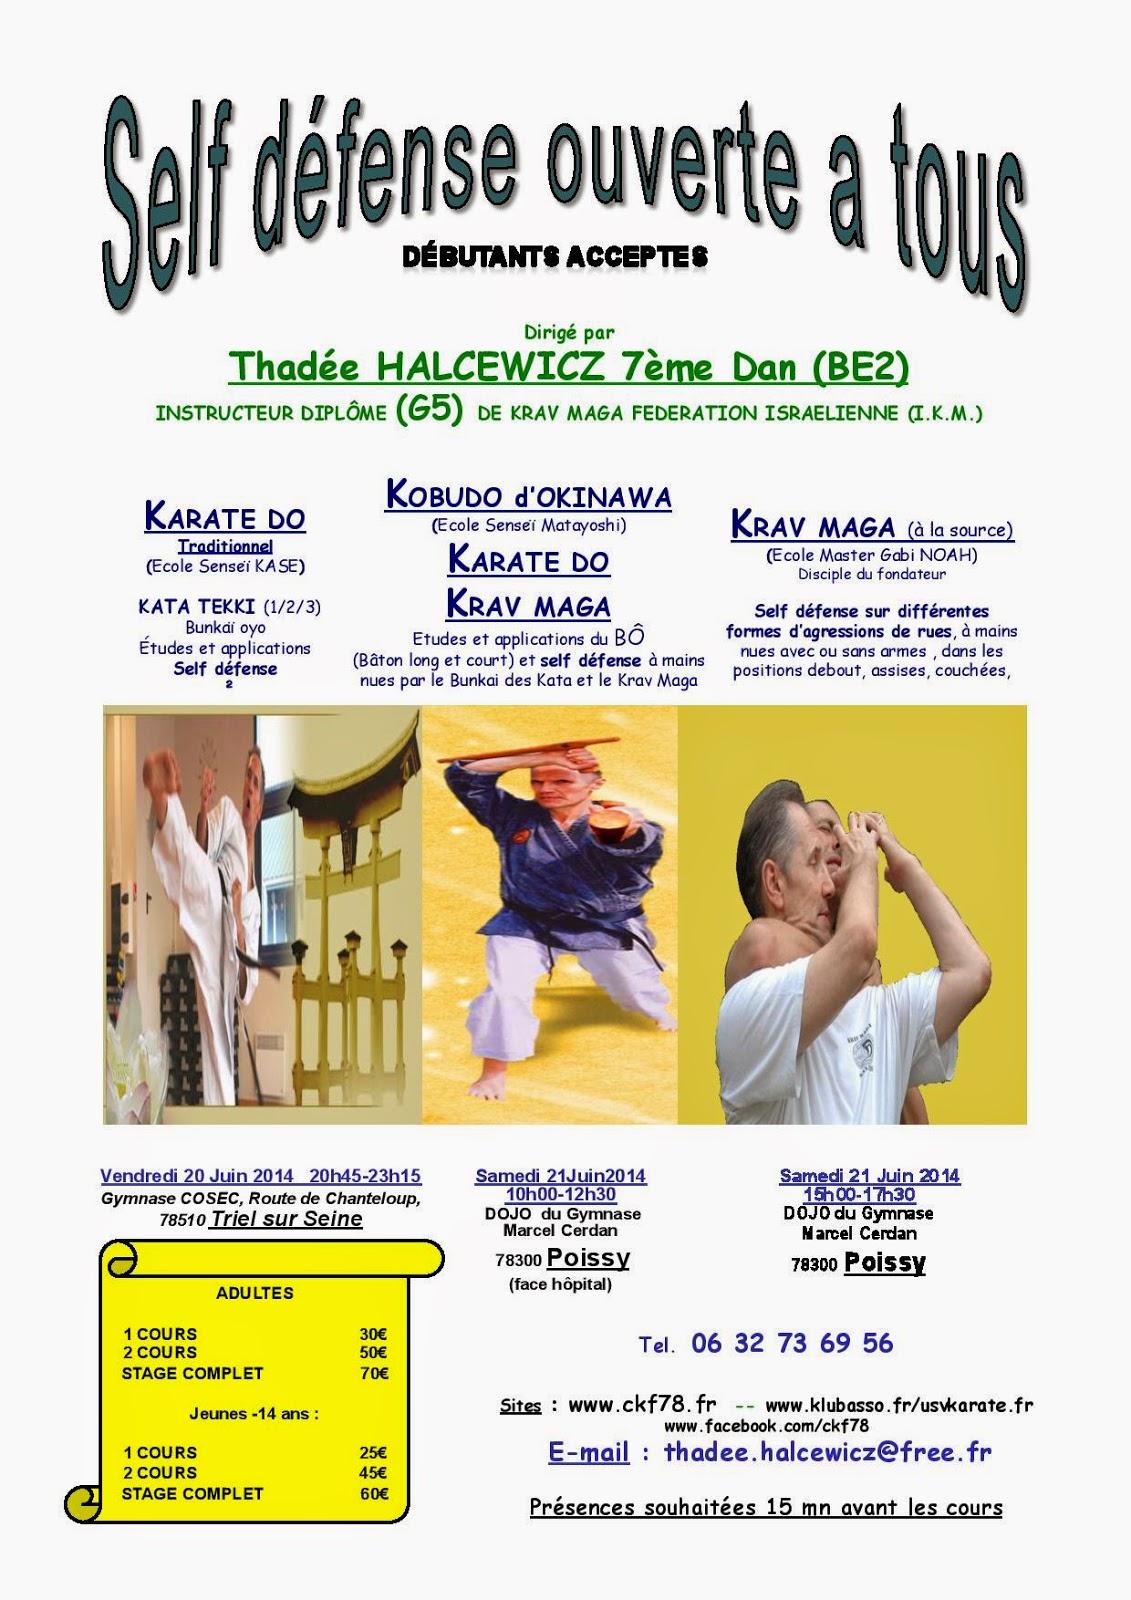 stage self défense ouvert à tous juin 2014 Thadée Halcewicz